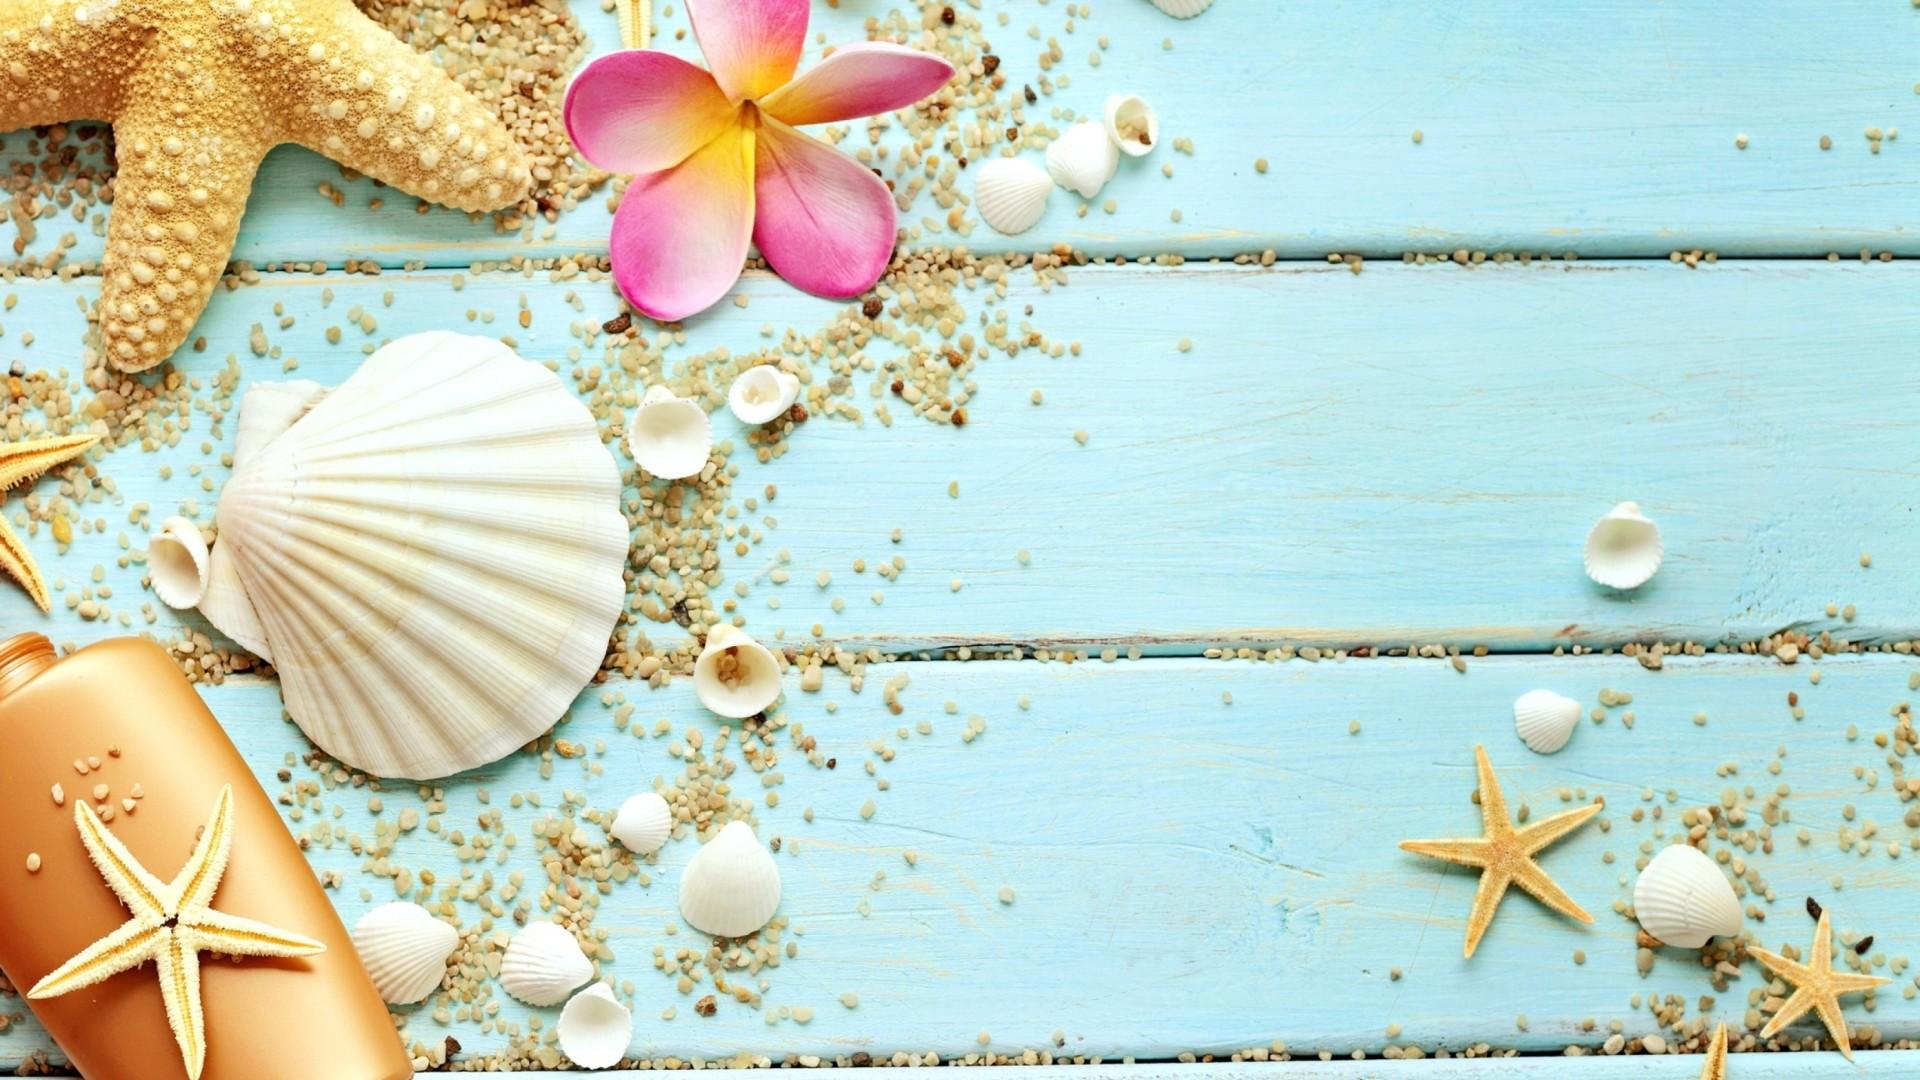 Seashells On Boards wallpaper photo hd